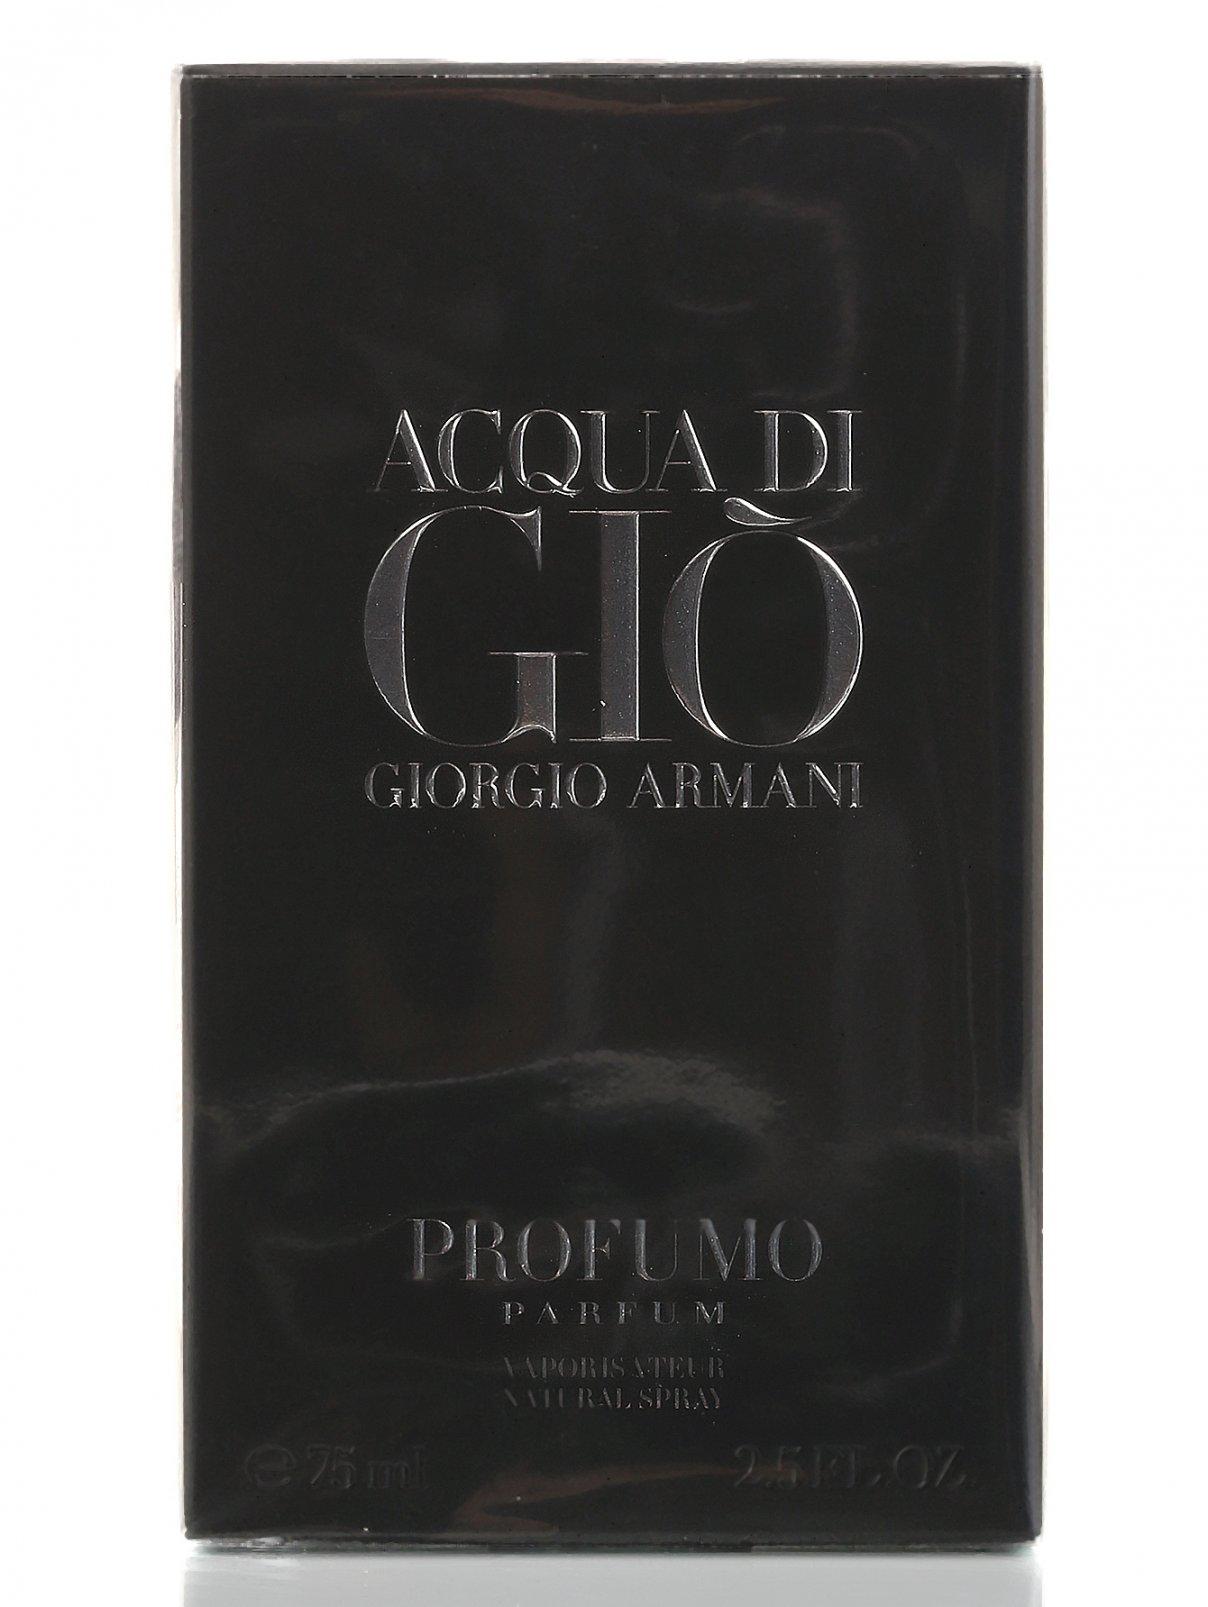 Парфюмерная вода - Acqua Di Gio Profumo, 75ml Giorgio Armani  –  Модель Общий вид